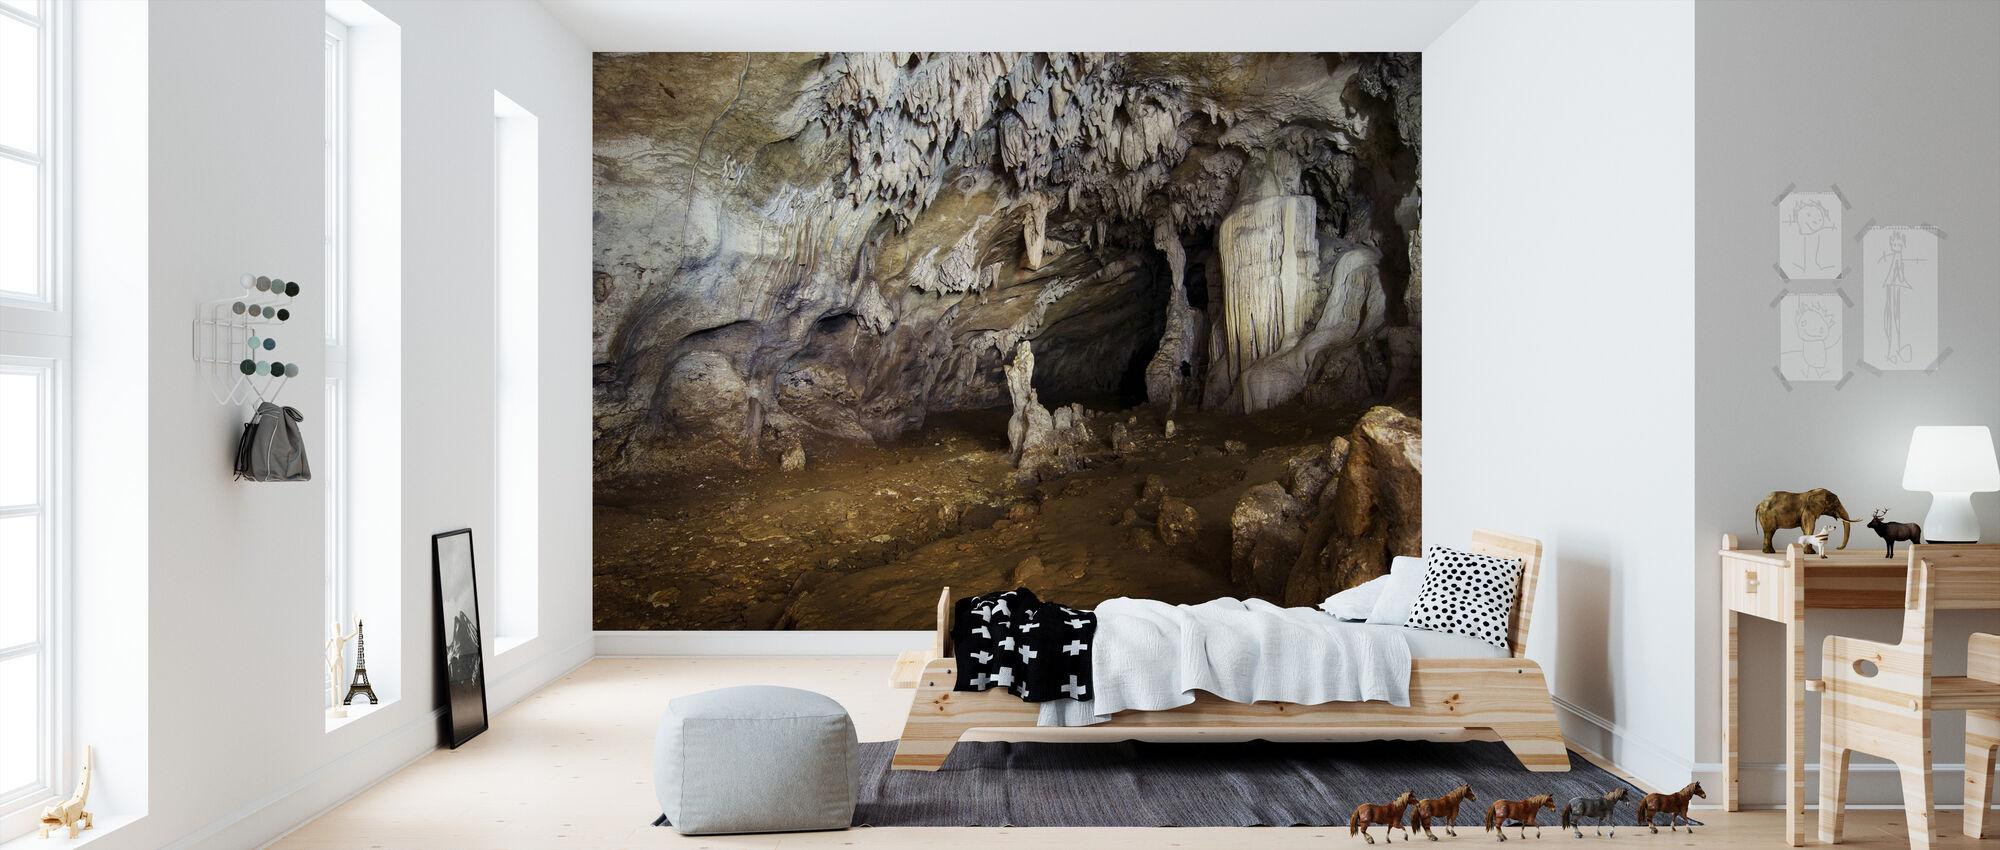 sohoton cave mit fototapeten einrichten photowall. Black Bedroom Furniture Sets. Home Design Ideas